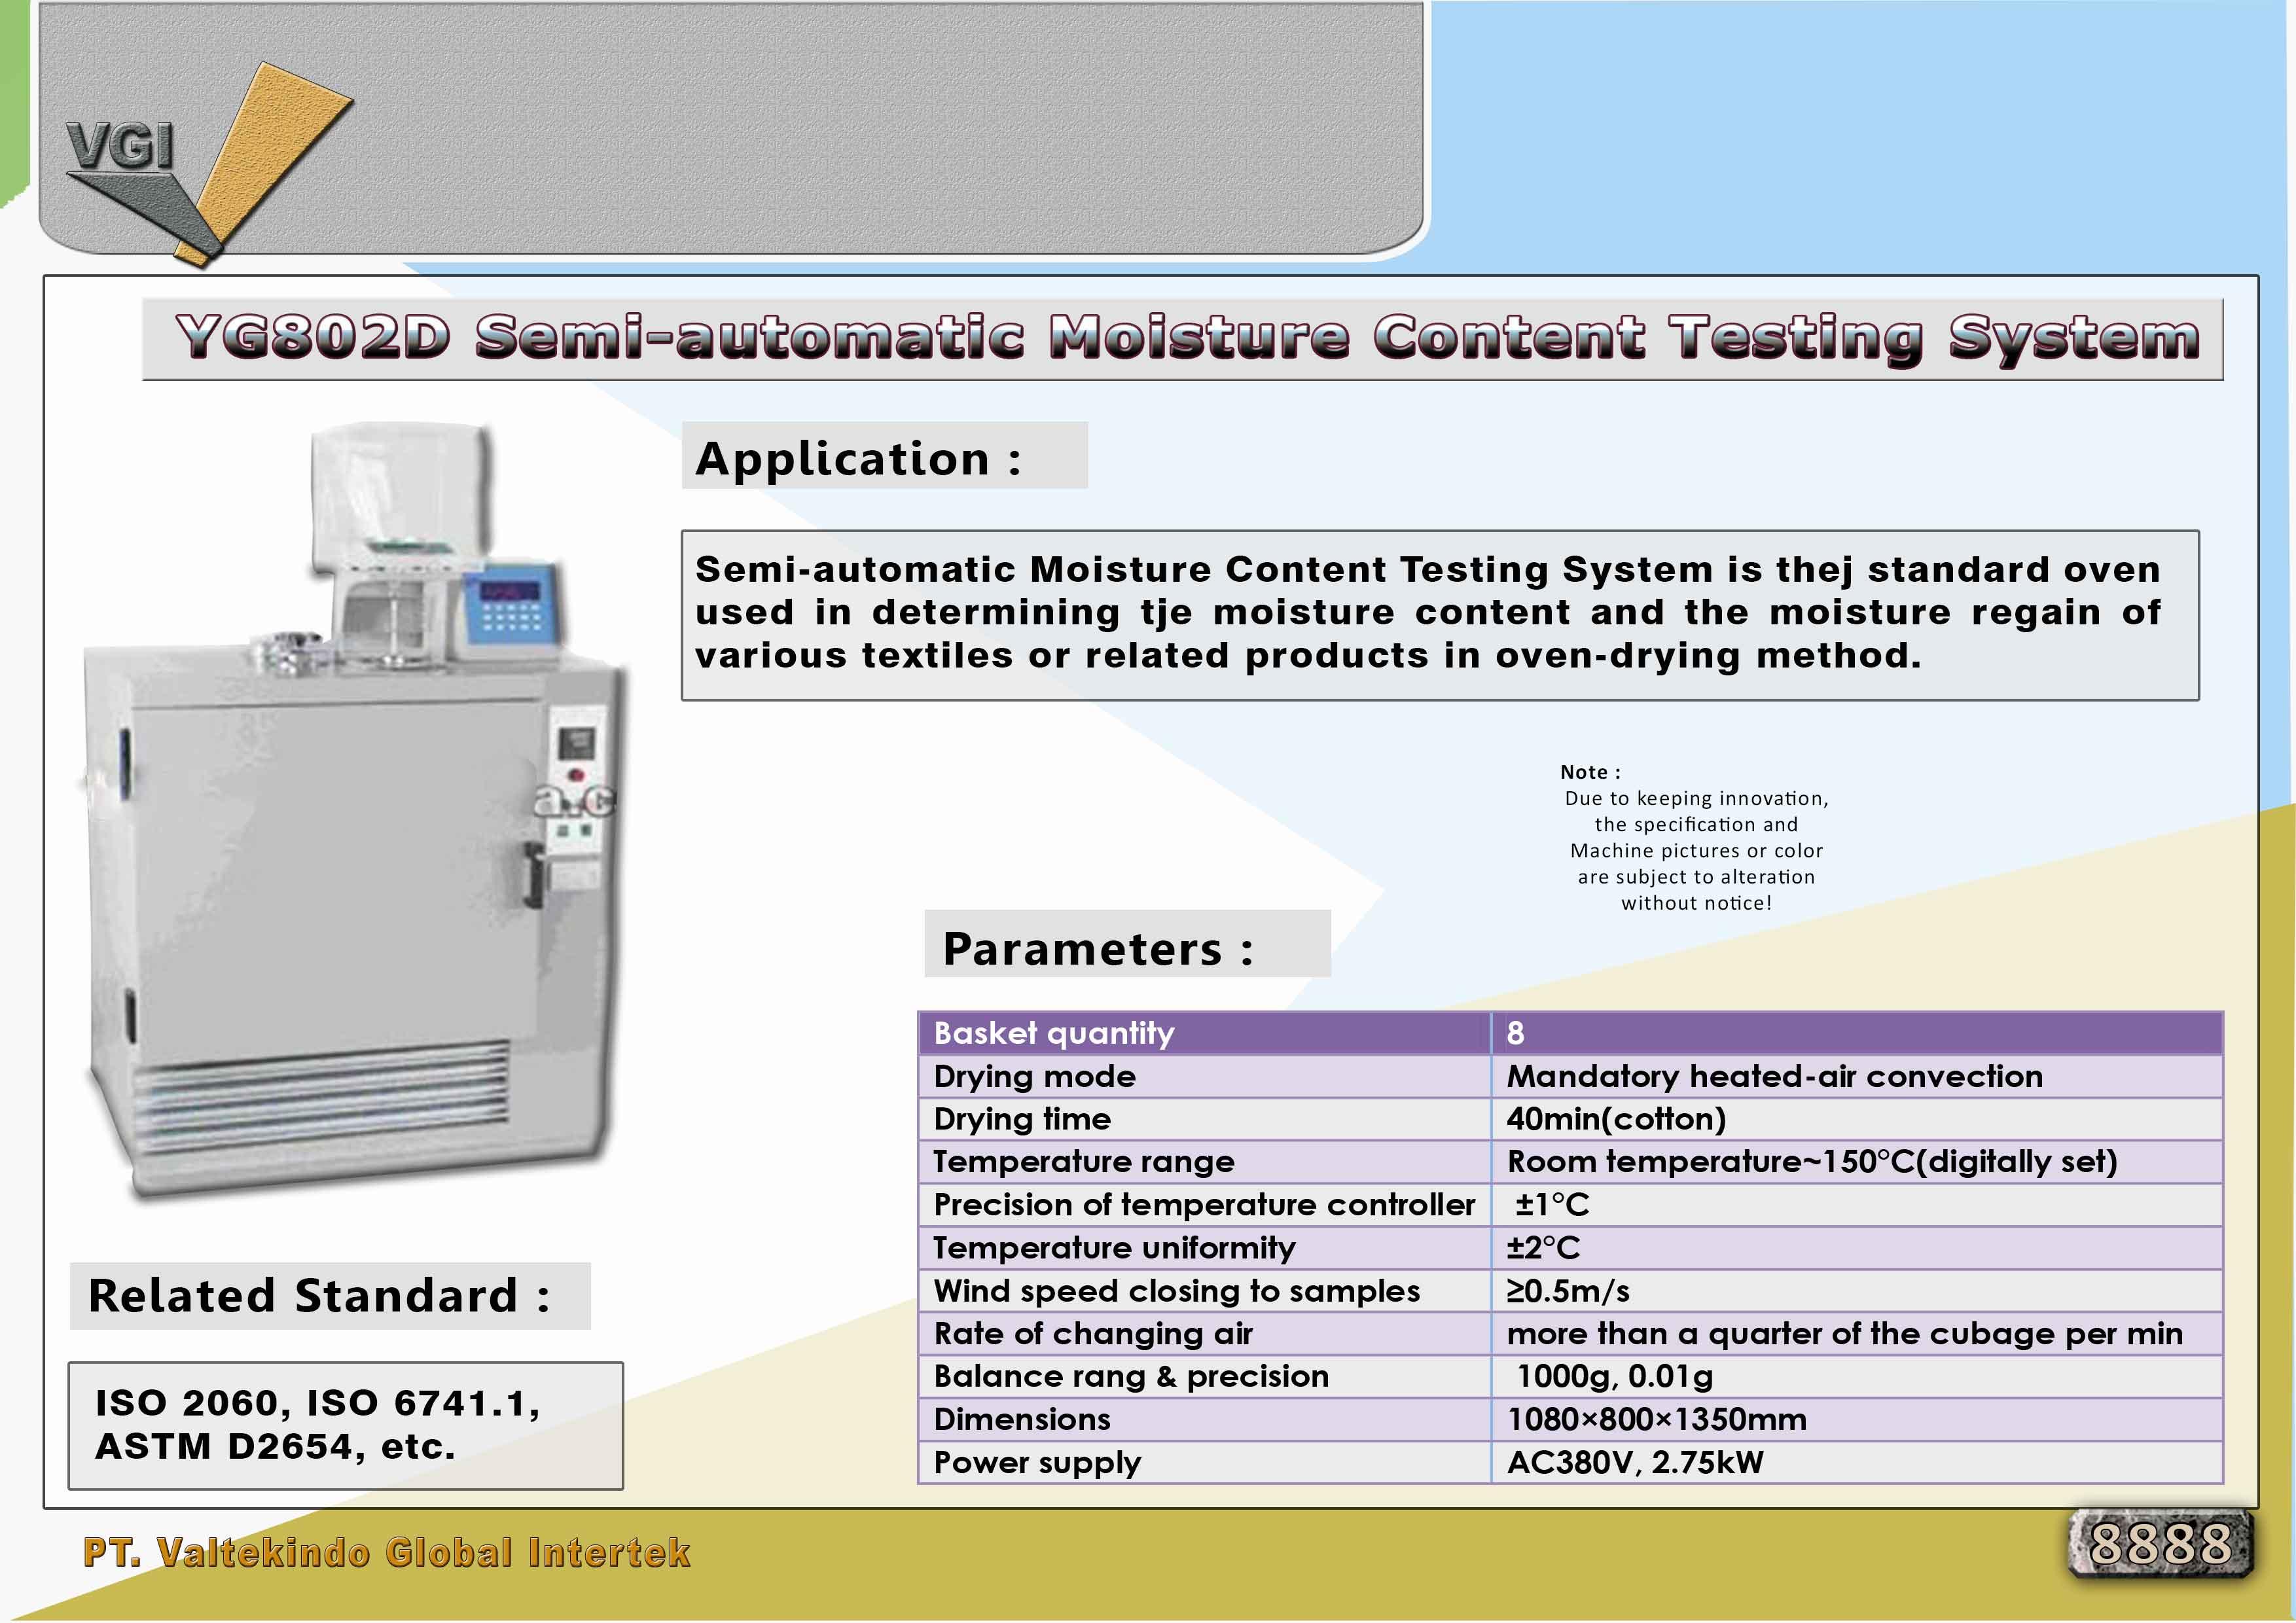 jual mesin Semi-Automatic Moisture Content Testing System Semi-Automatic Moisture Content Testing System